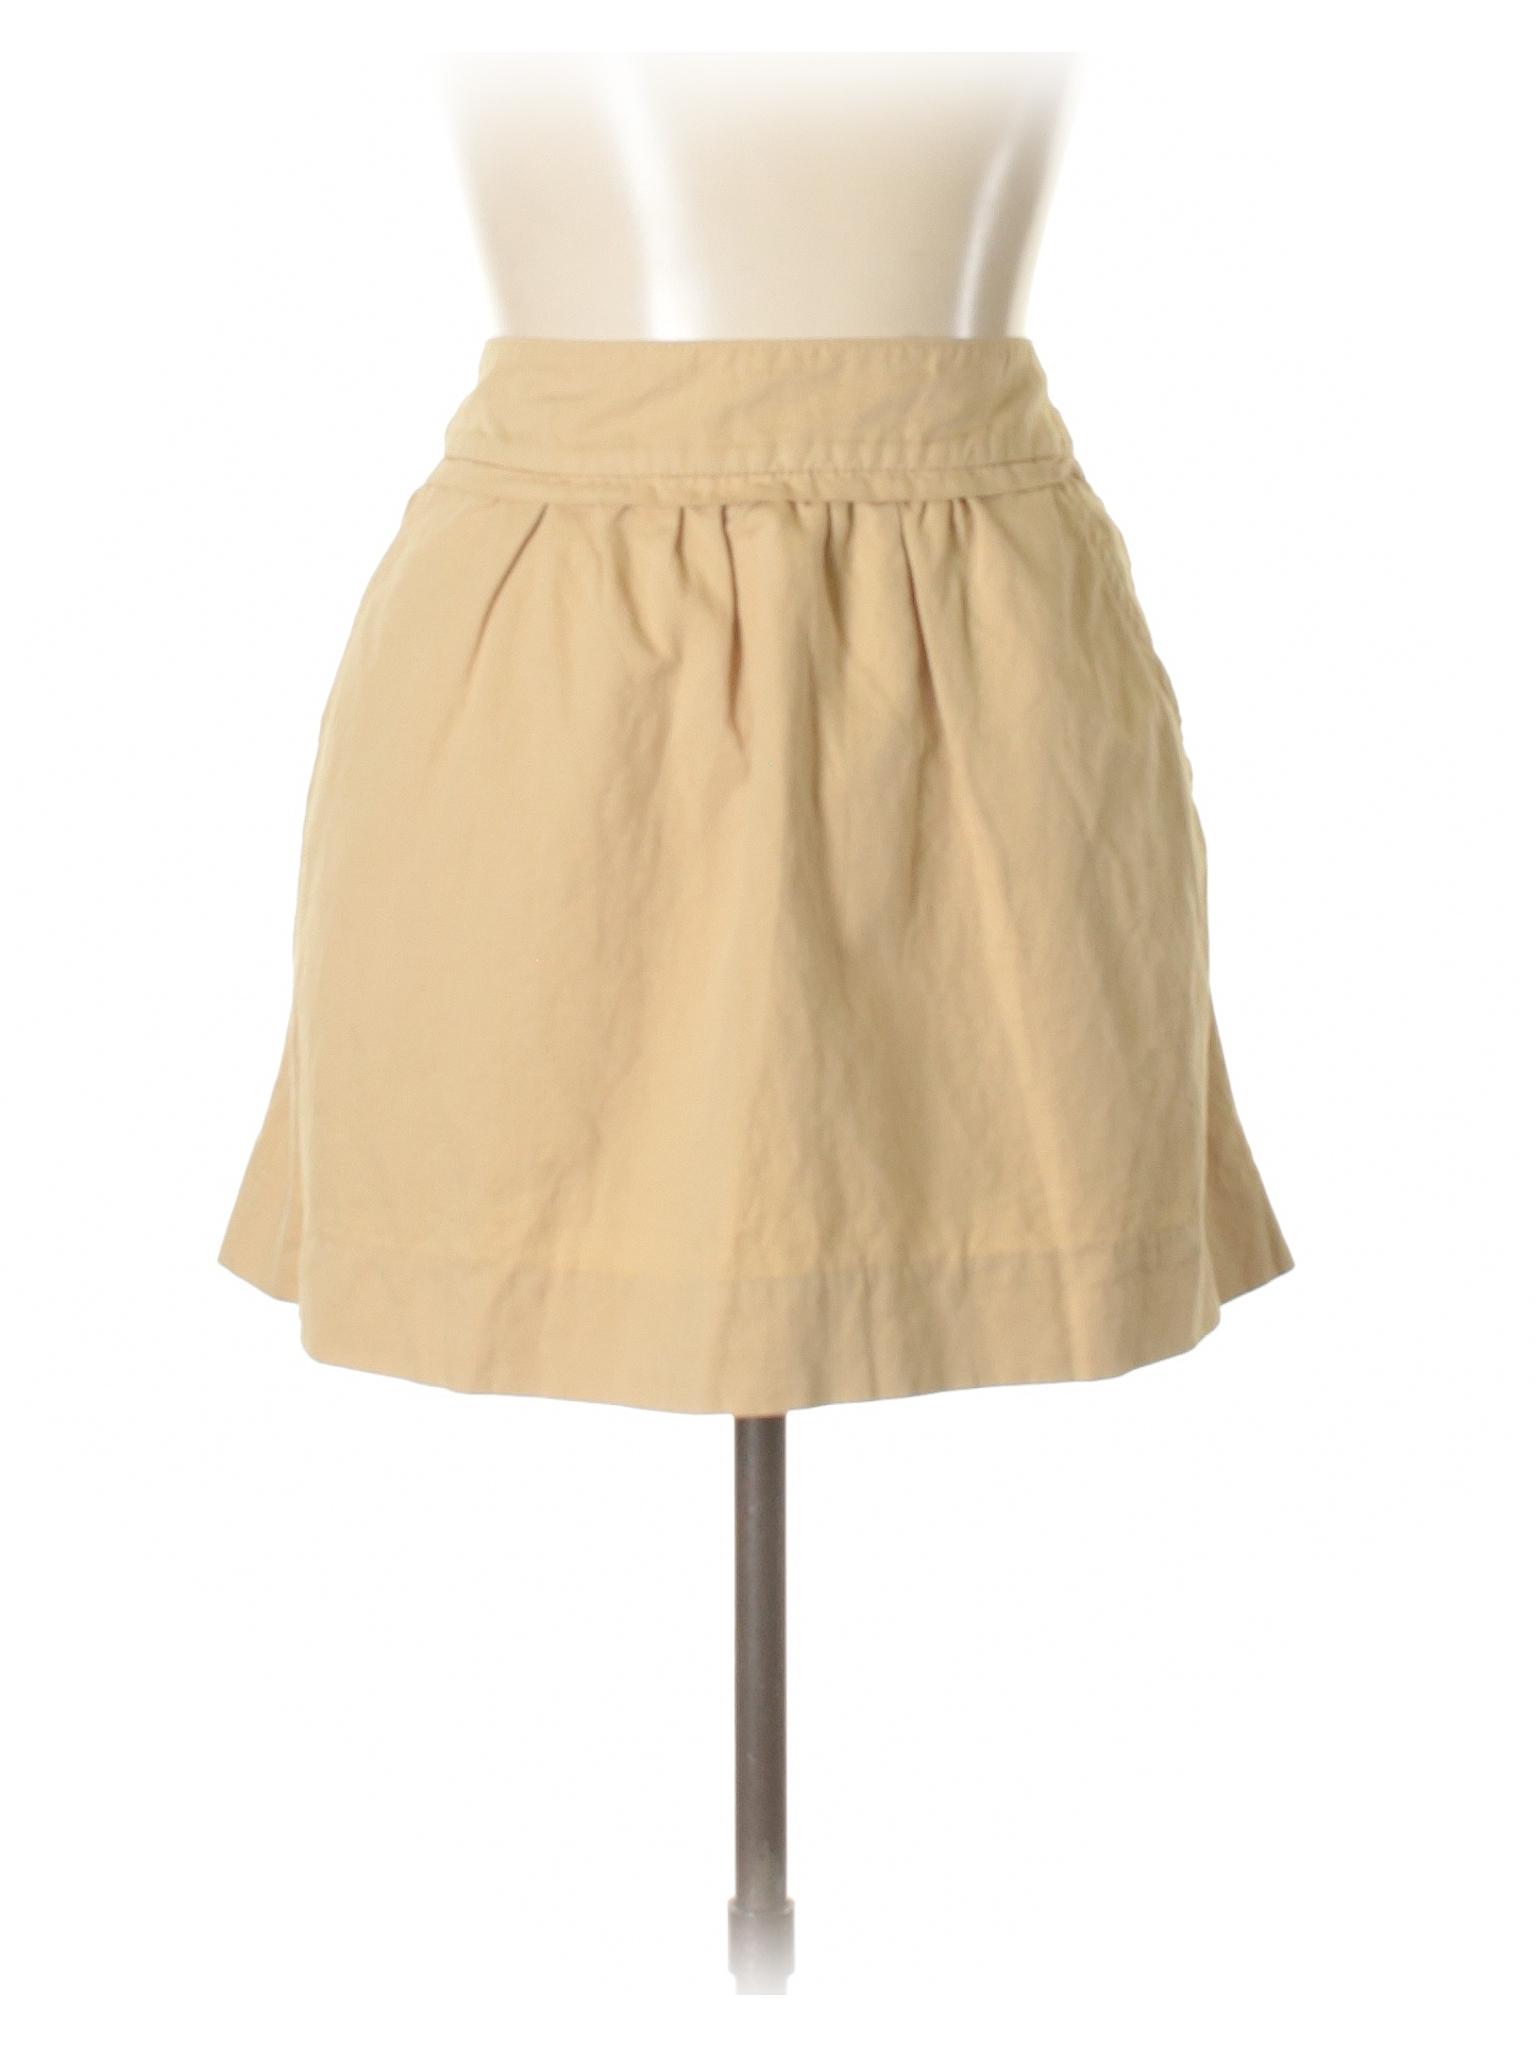 Skirt Boutique Crew Boutique Casual J Skirt Casual Crew J Boutique TnqWa